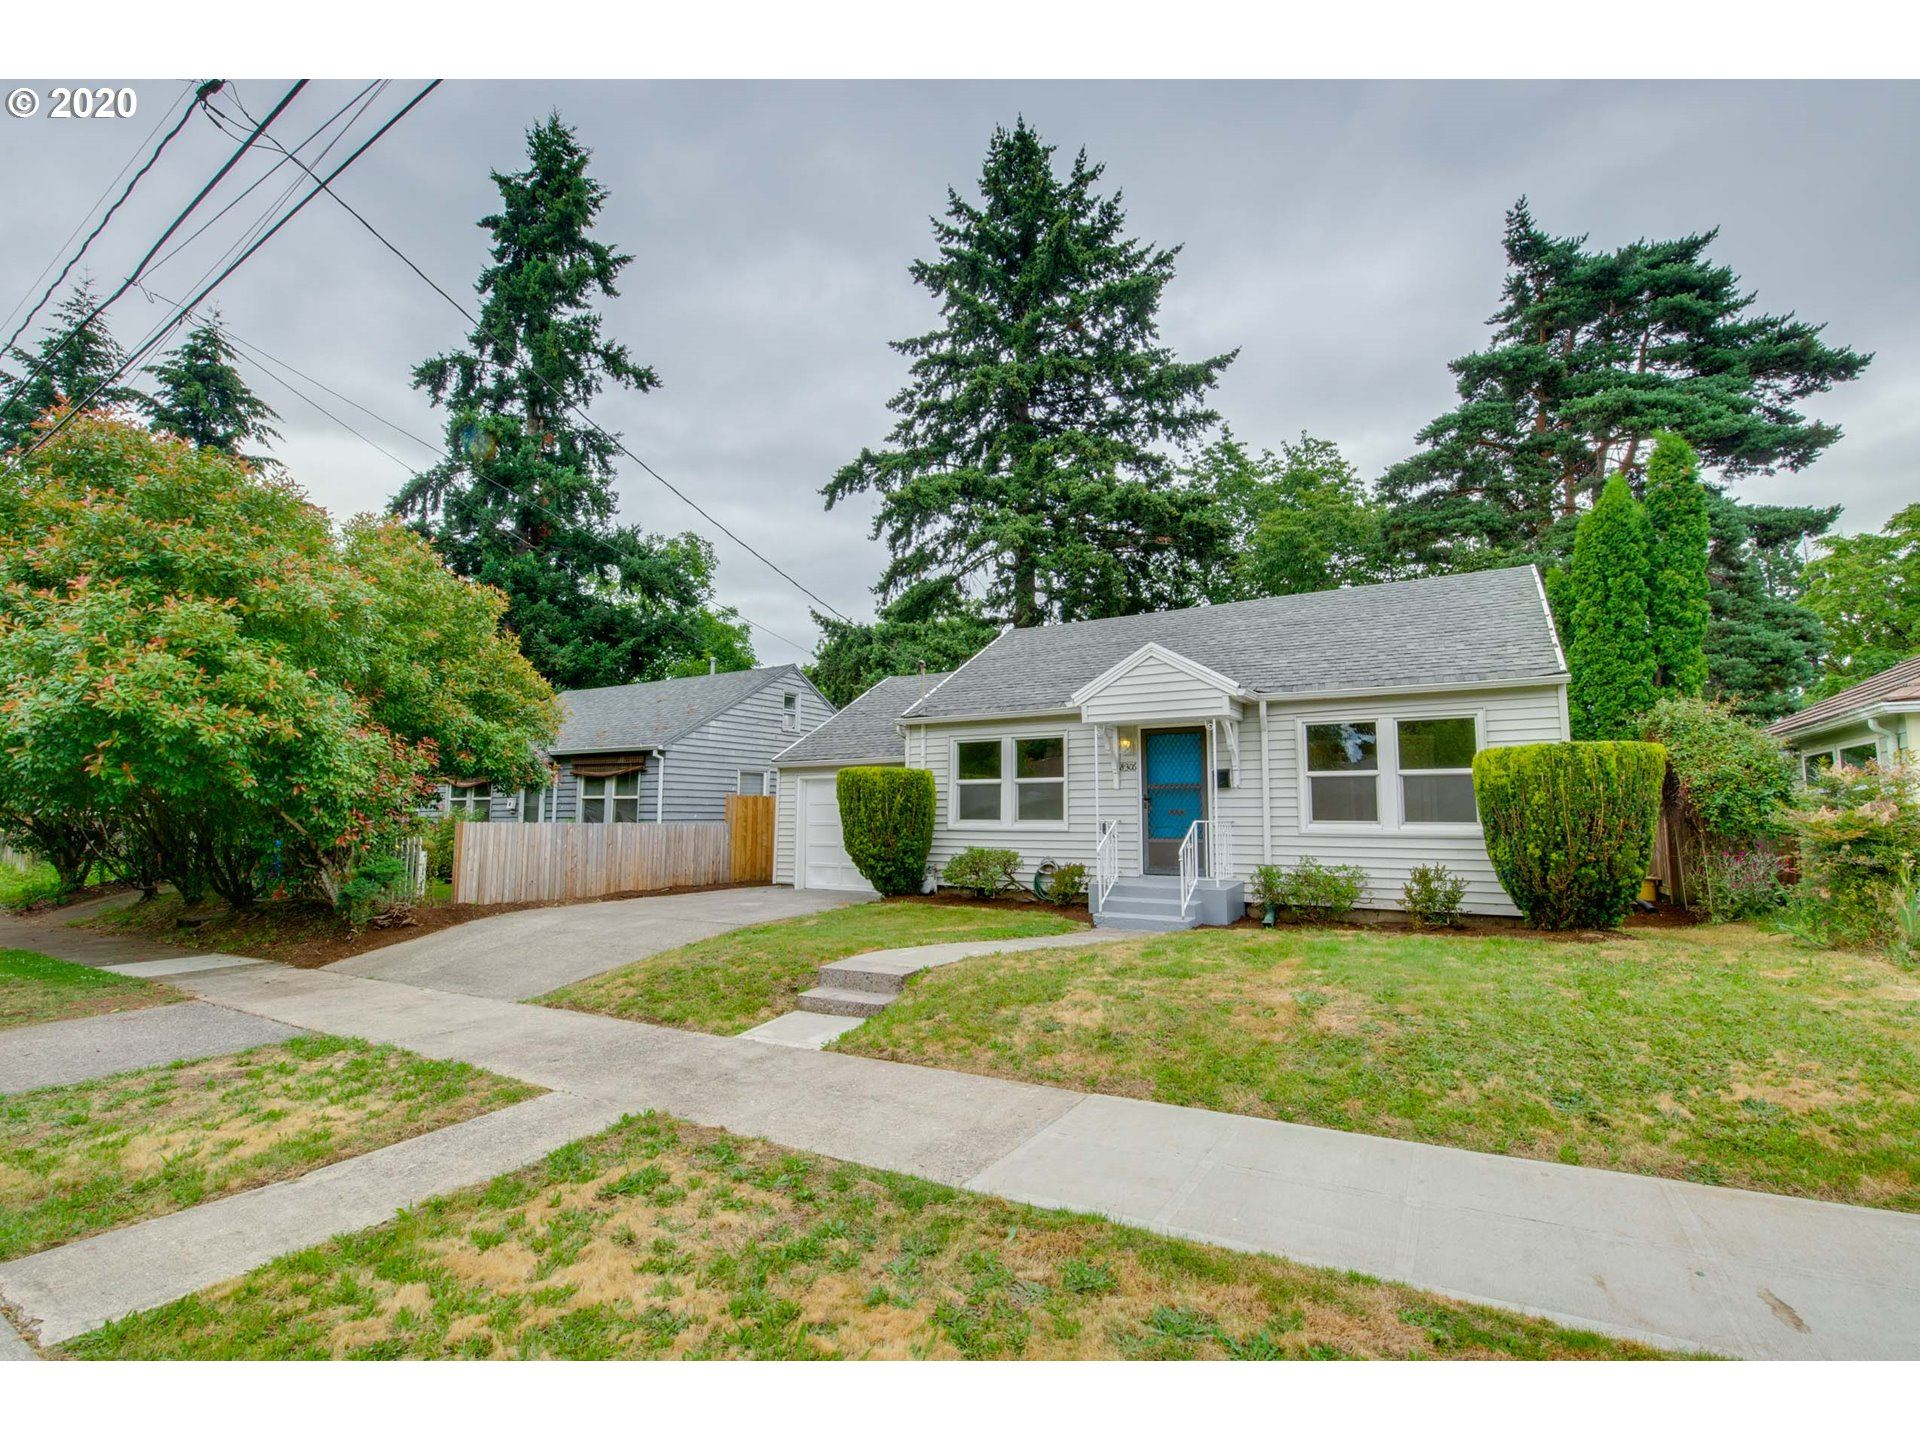 8306 N WAYLAND AVE, Portland, OR 97203 - MLS#: 20366806